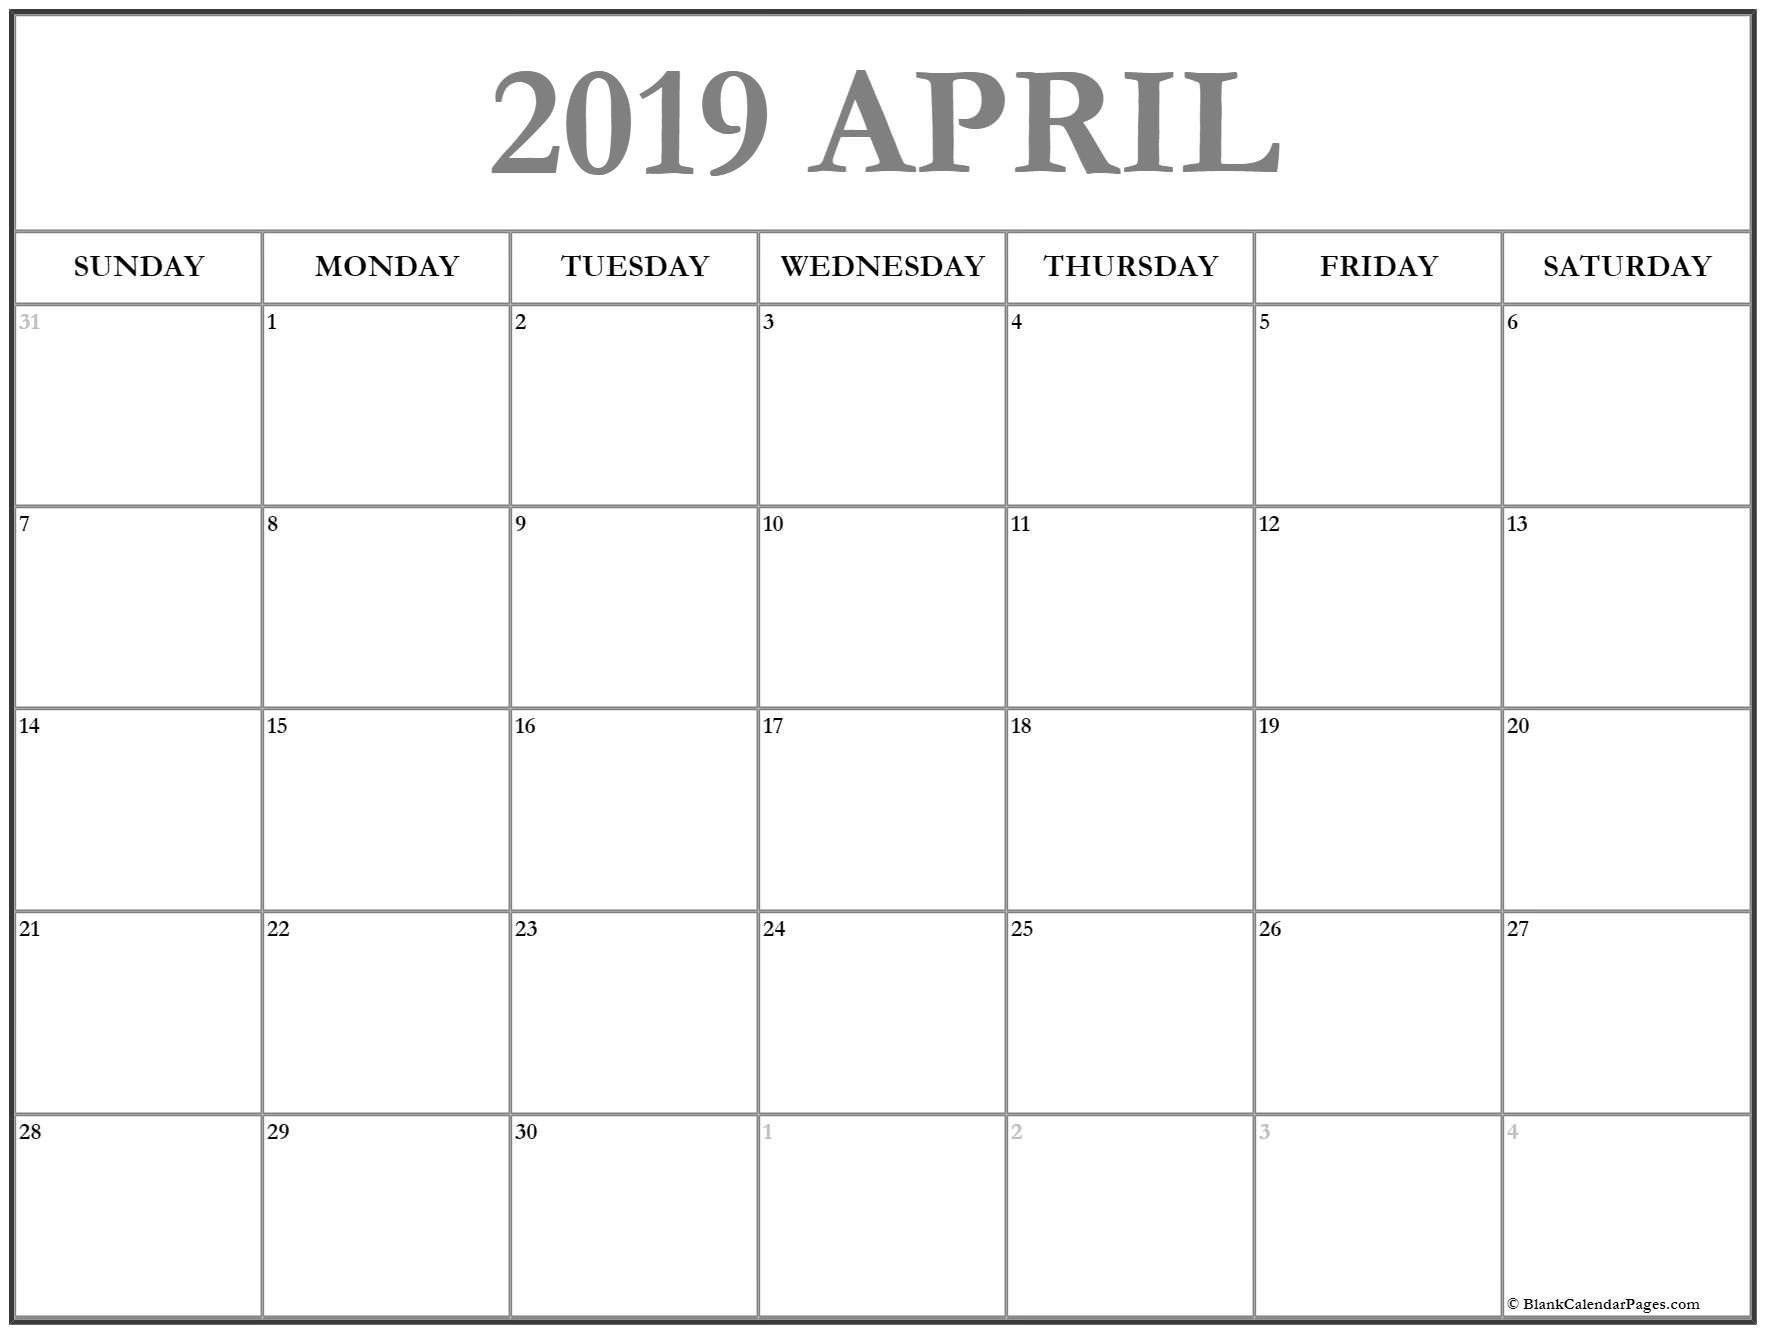 April 2019 Calendar | Free Printable Monthly Calendars Calendar 2019 Pages